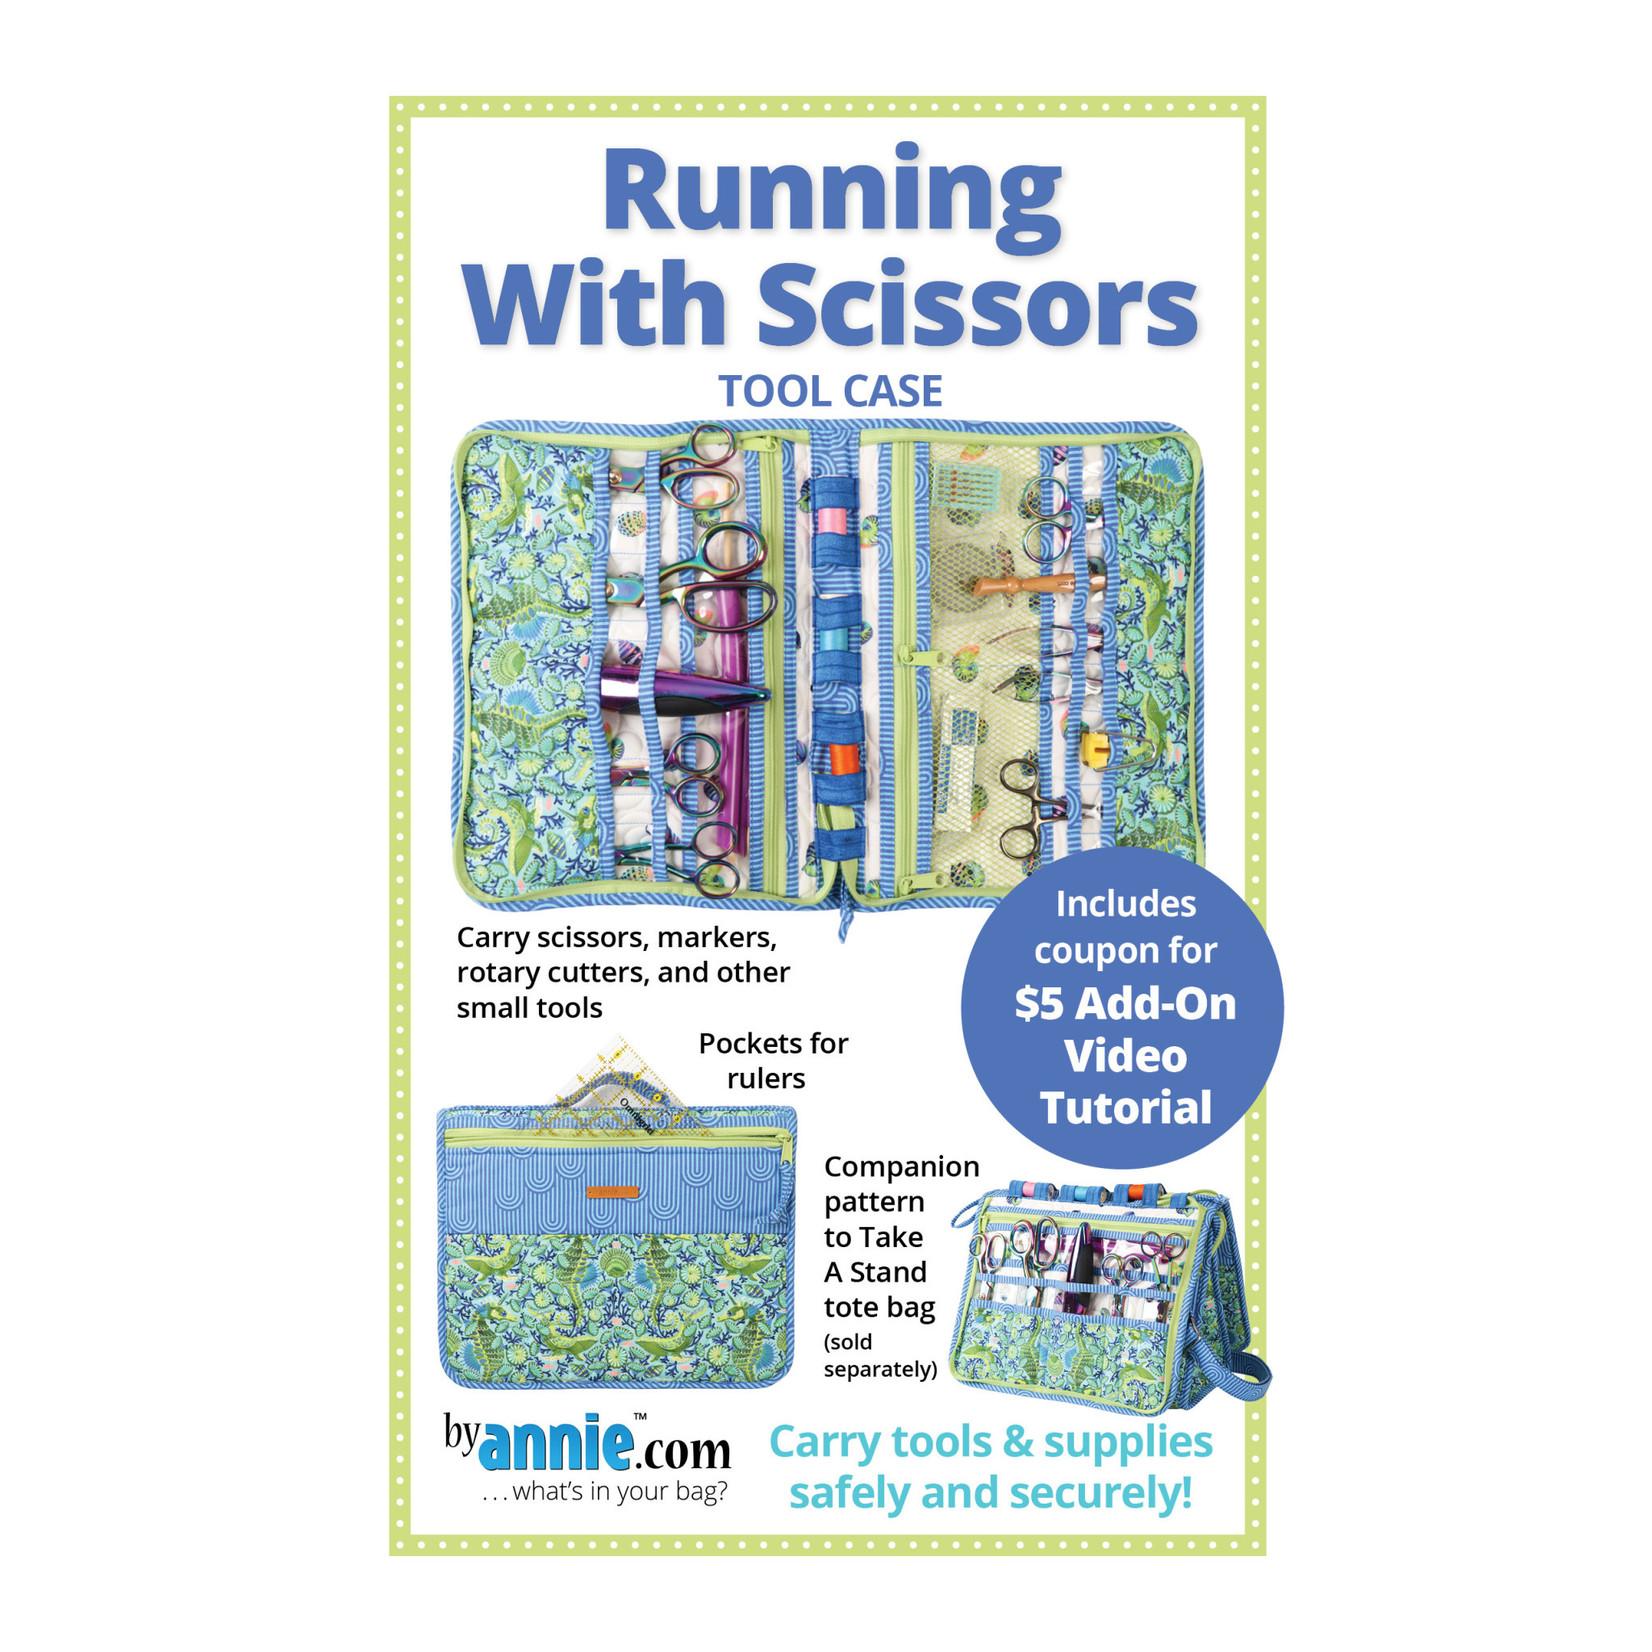 BY ANNIE RUNNING WITH SCISSORS PATTERN